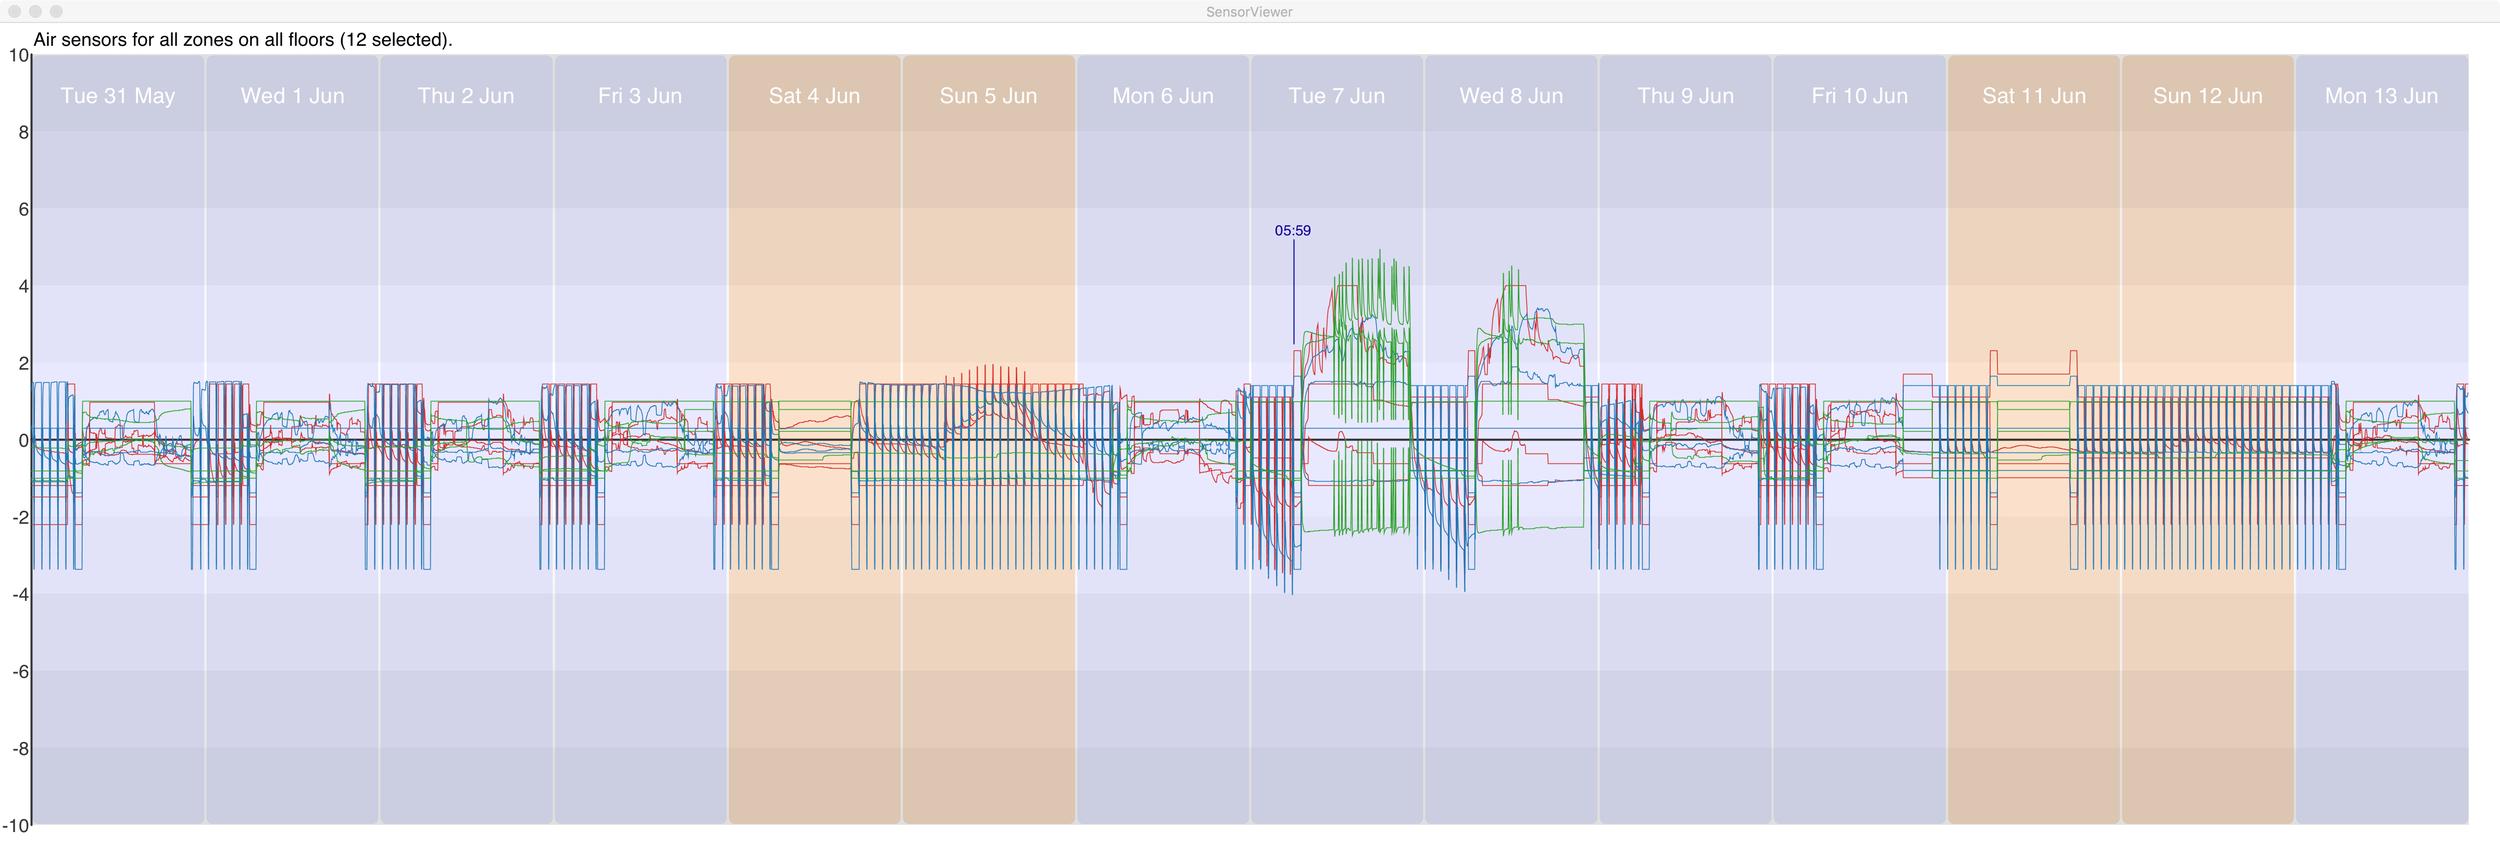 Figure 9 Air flow sensor readings. (click image for full size)